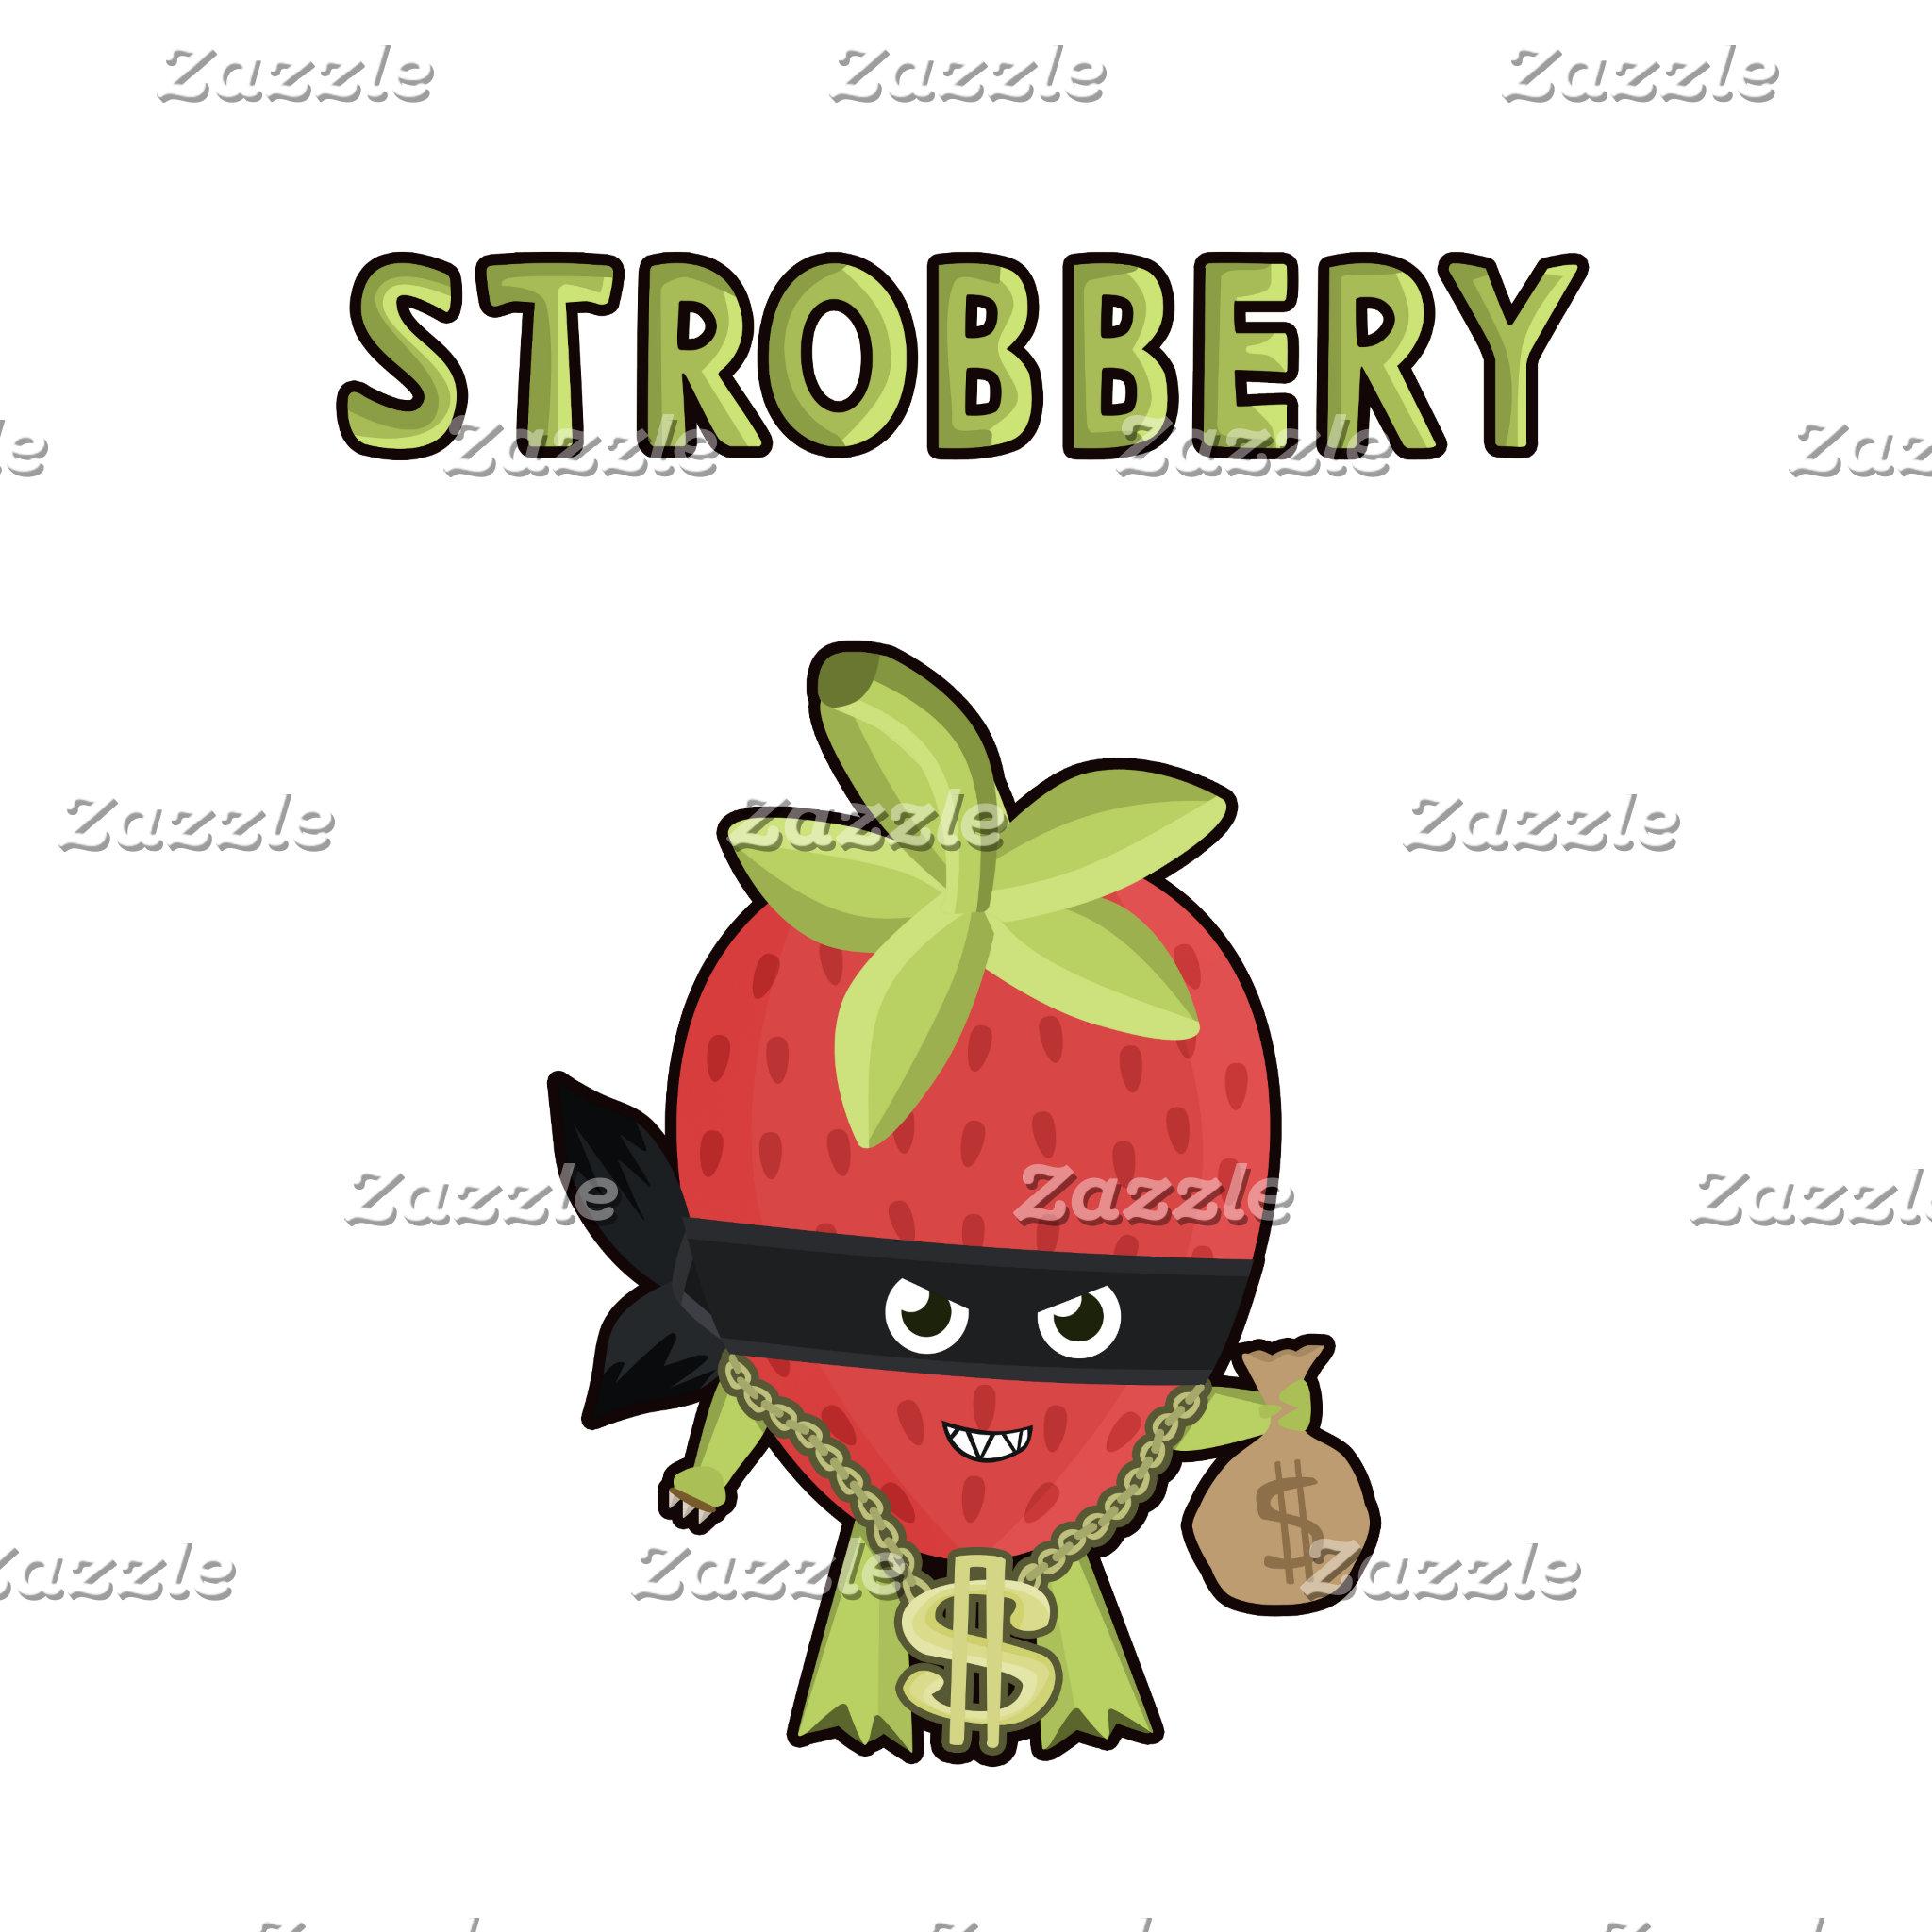 Strobbery